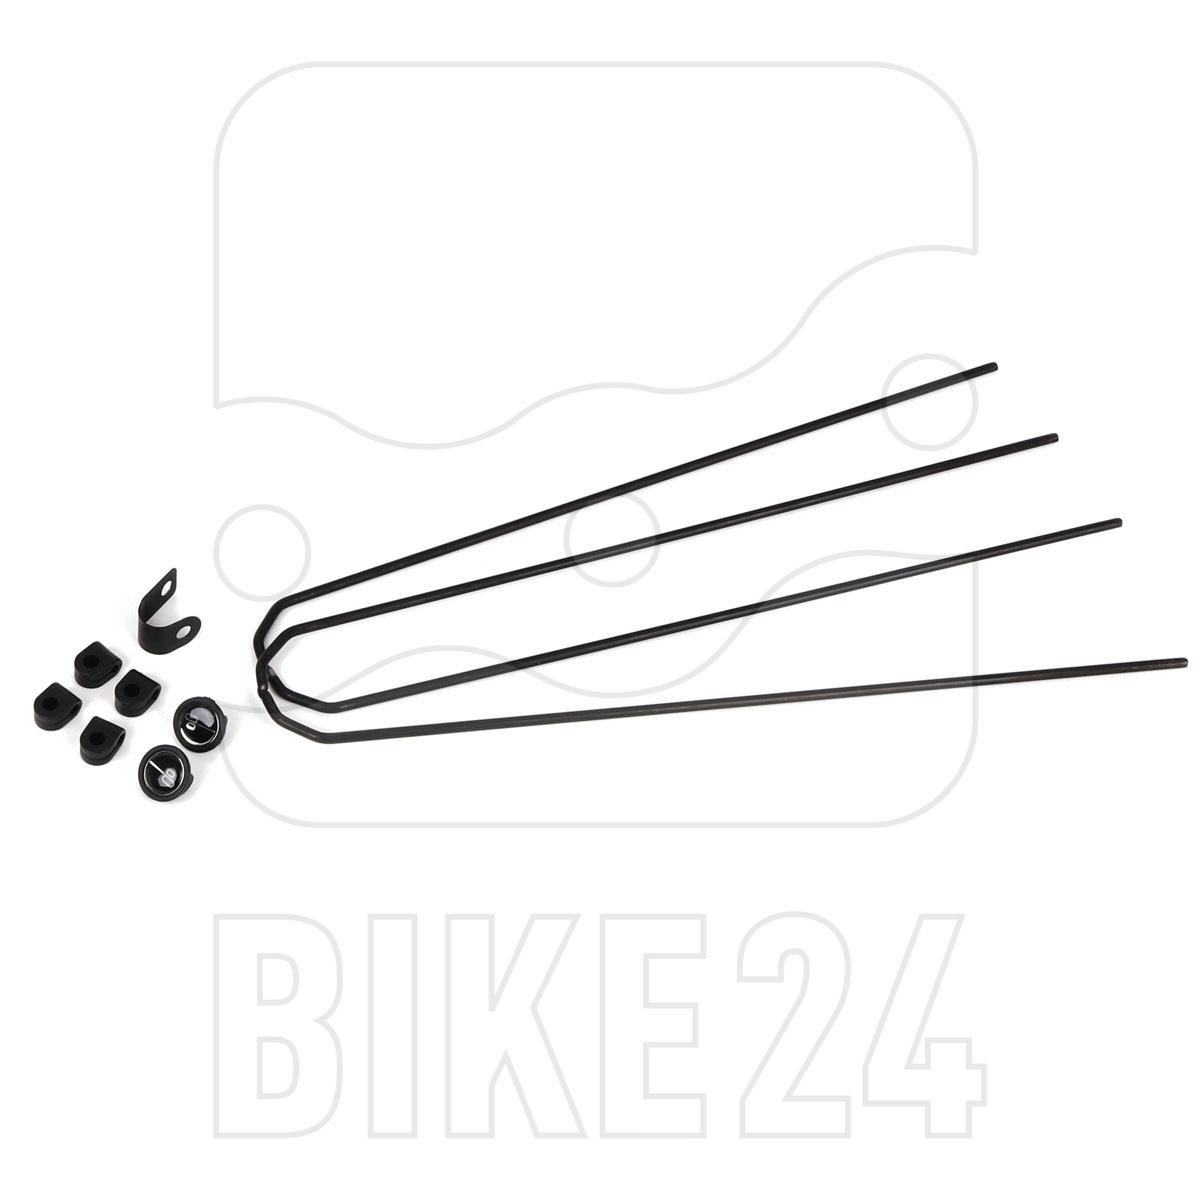 Image of BMC City Kit Fenders for Alpenchallenge AMP (MY 2019) - 301712